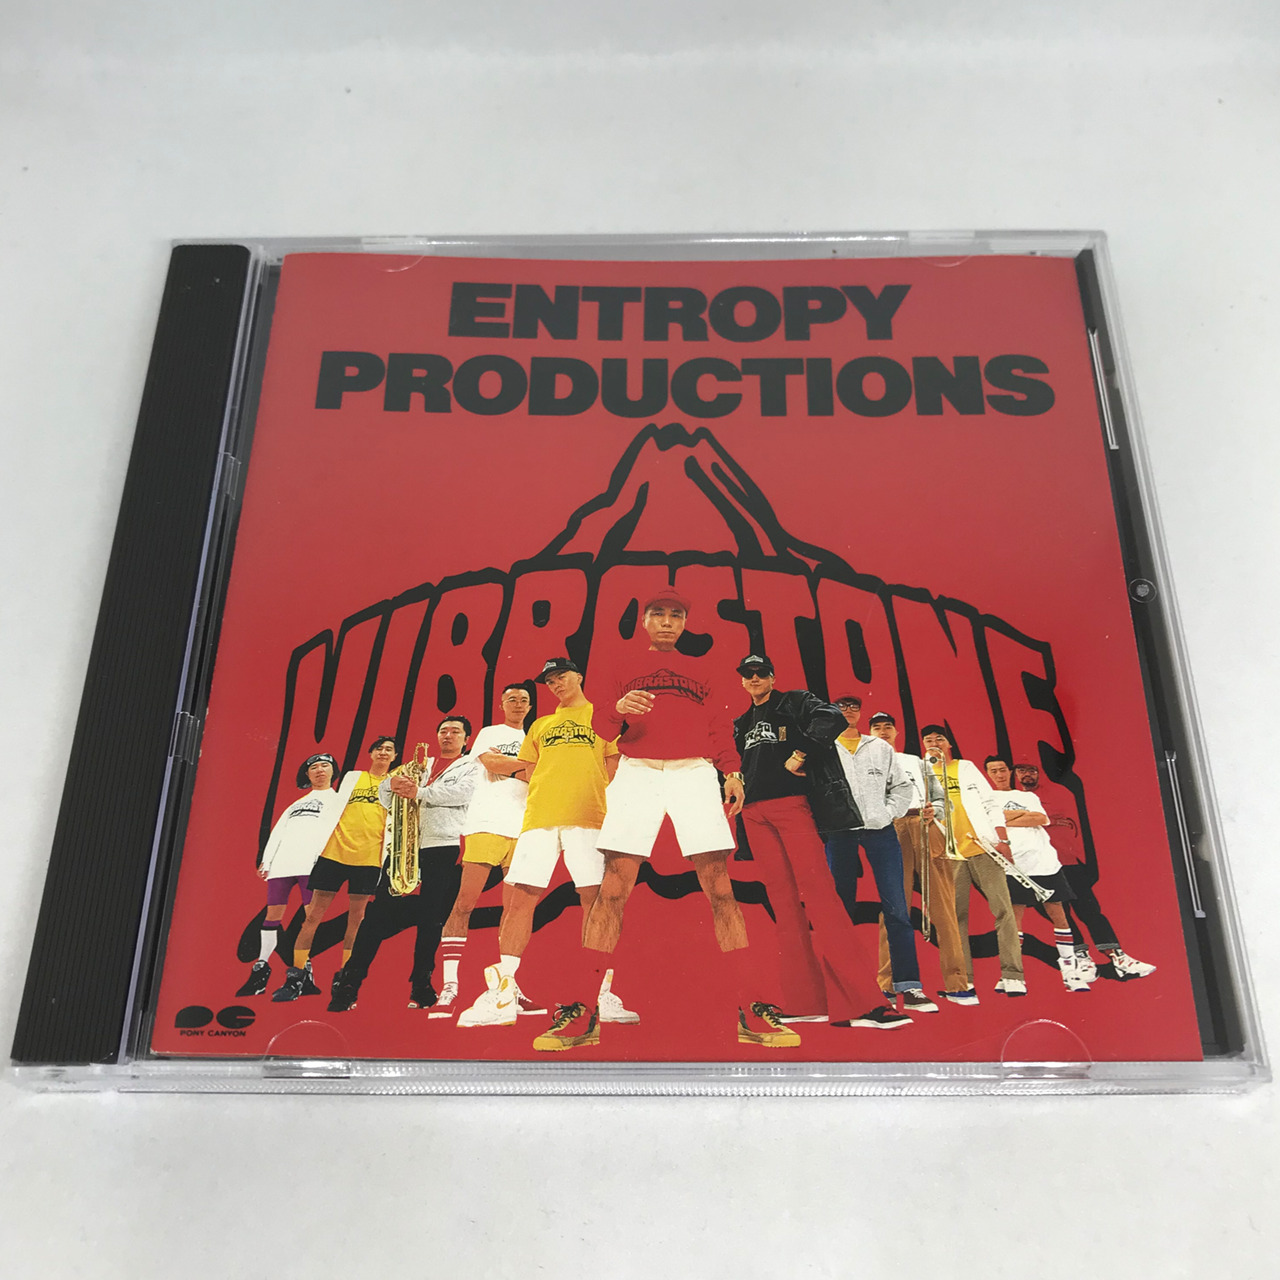 VIBRASTONE / ENTROPY PRODUCTIONS